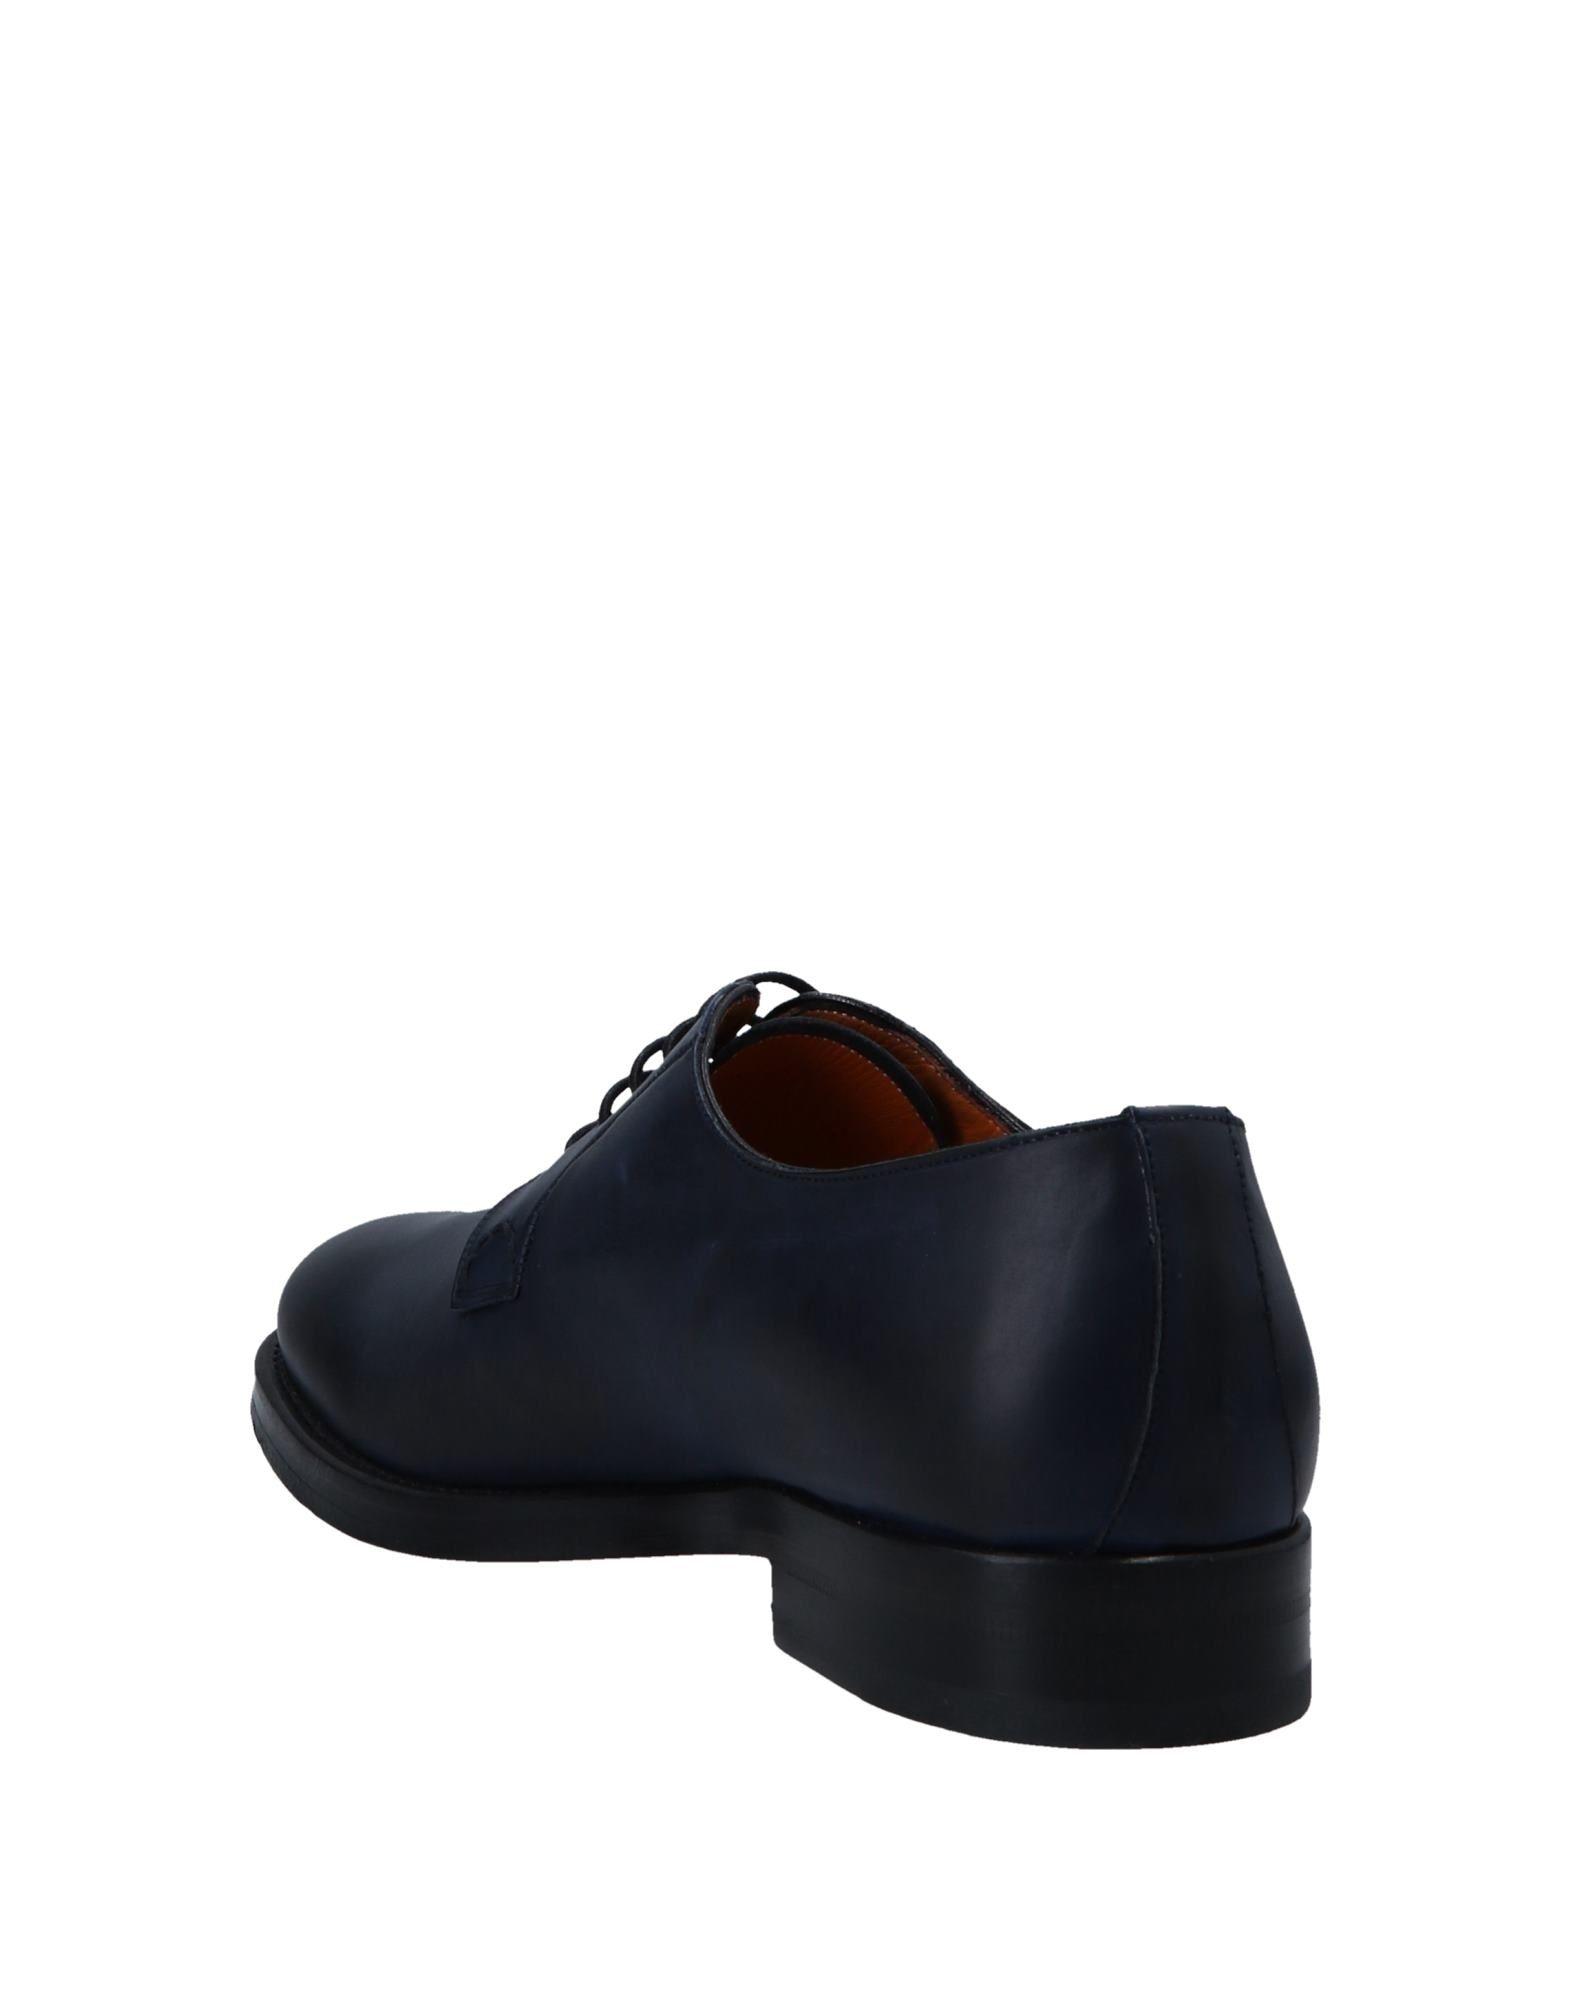 Barrett Schnürschuhe Herren Qualität  44983215AR Gute Qualität Herren beliebte Schuhe 3cbd5d